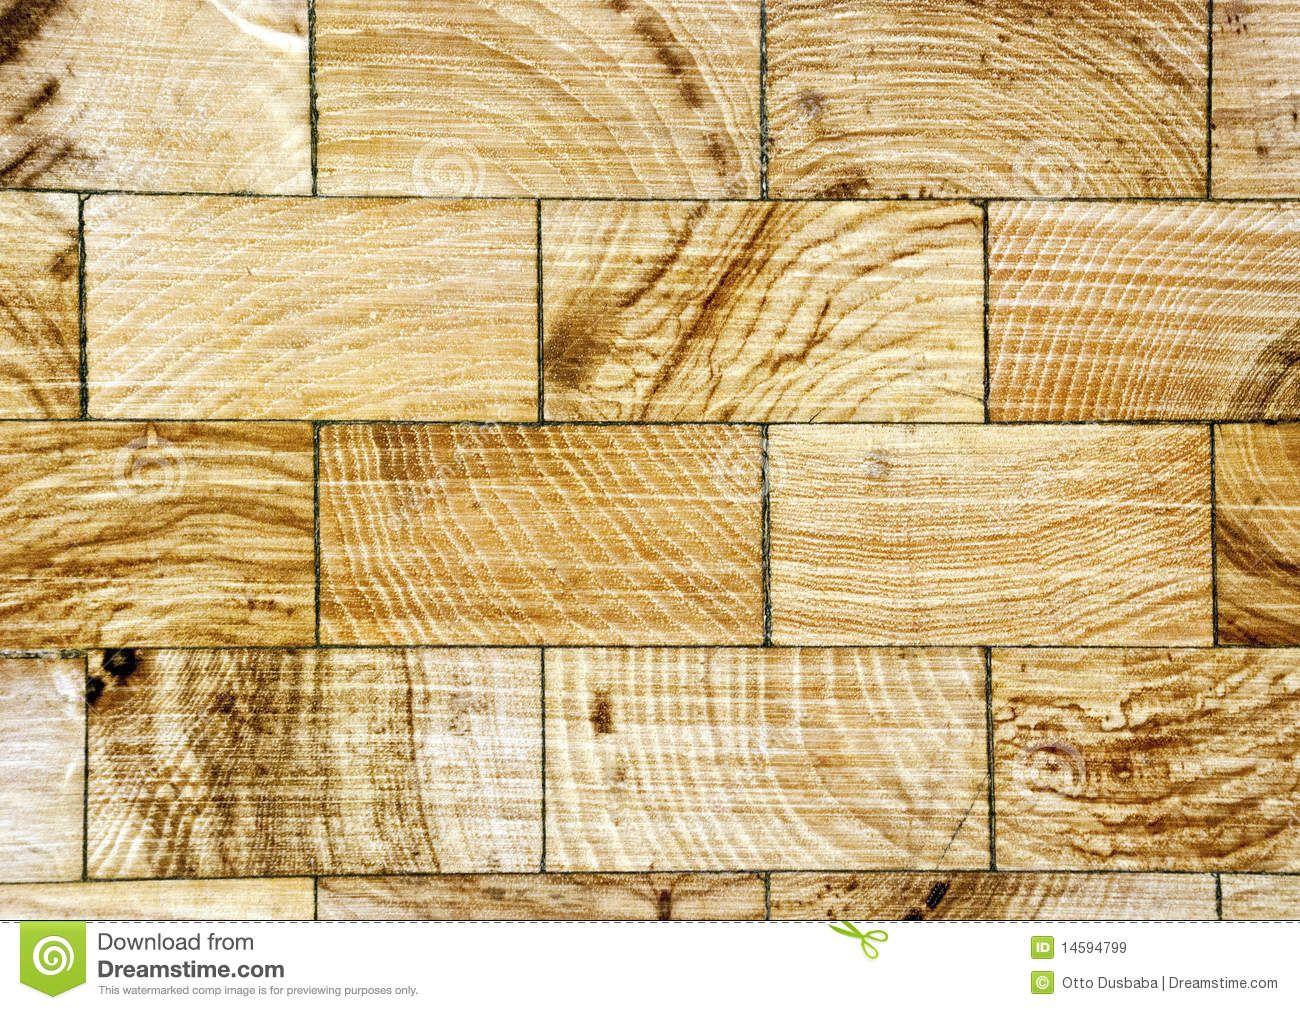 end grain wood floor layout patterns | Royalty Free Stock Images: Wood floor  with end - End Grain Wood Floor Layout Patterns Royalty Free Stock Images